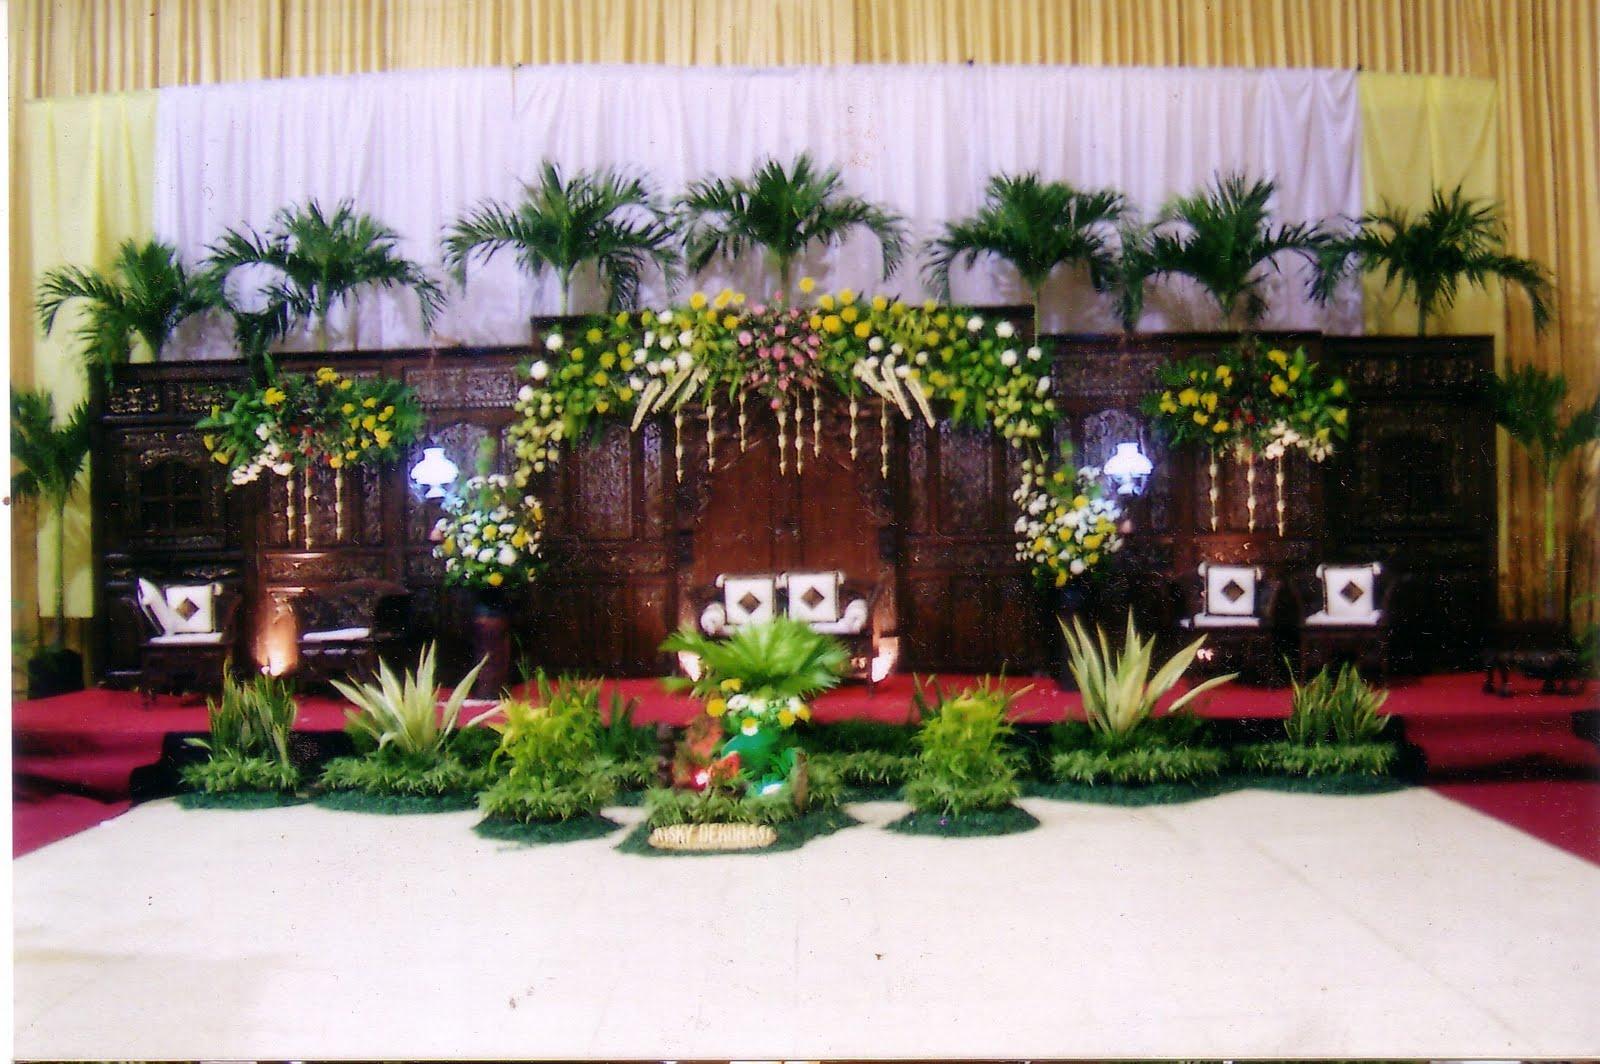 related to dekorasi perkawinan - photo #11